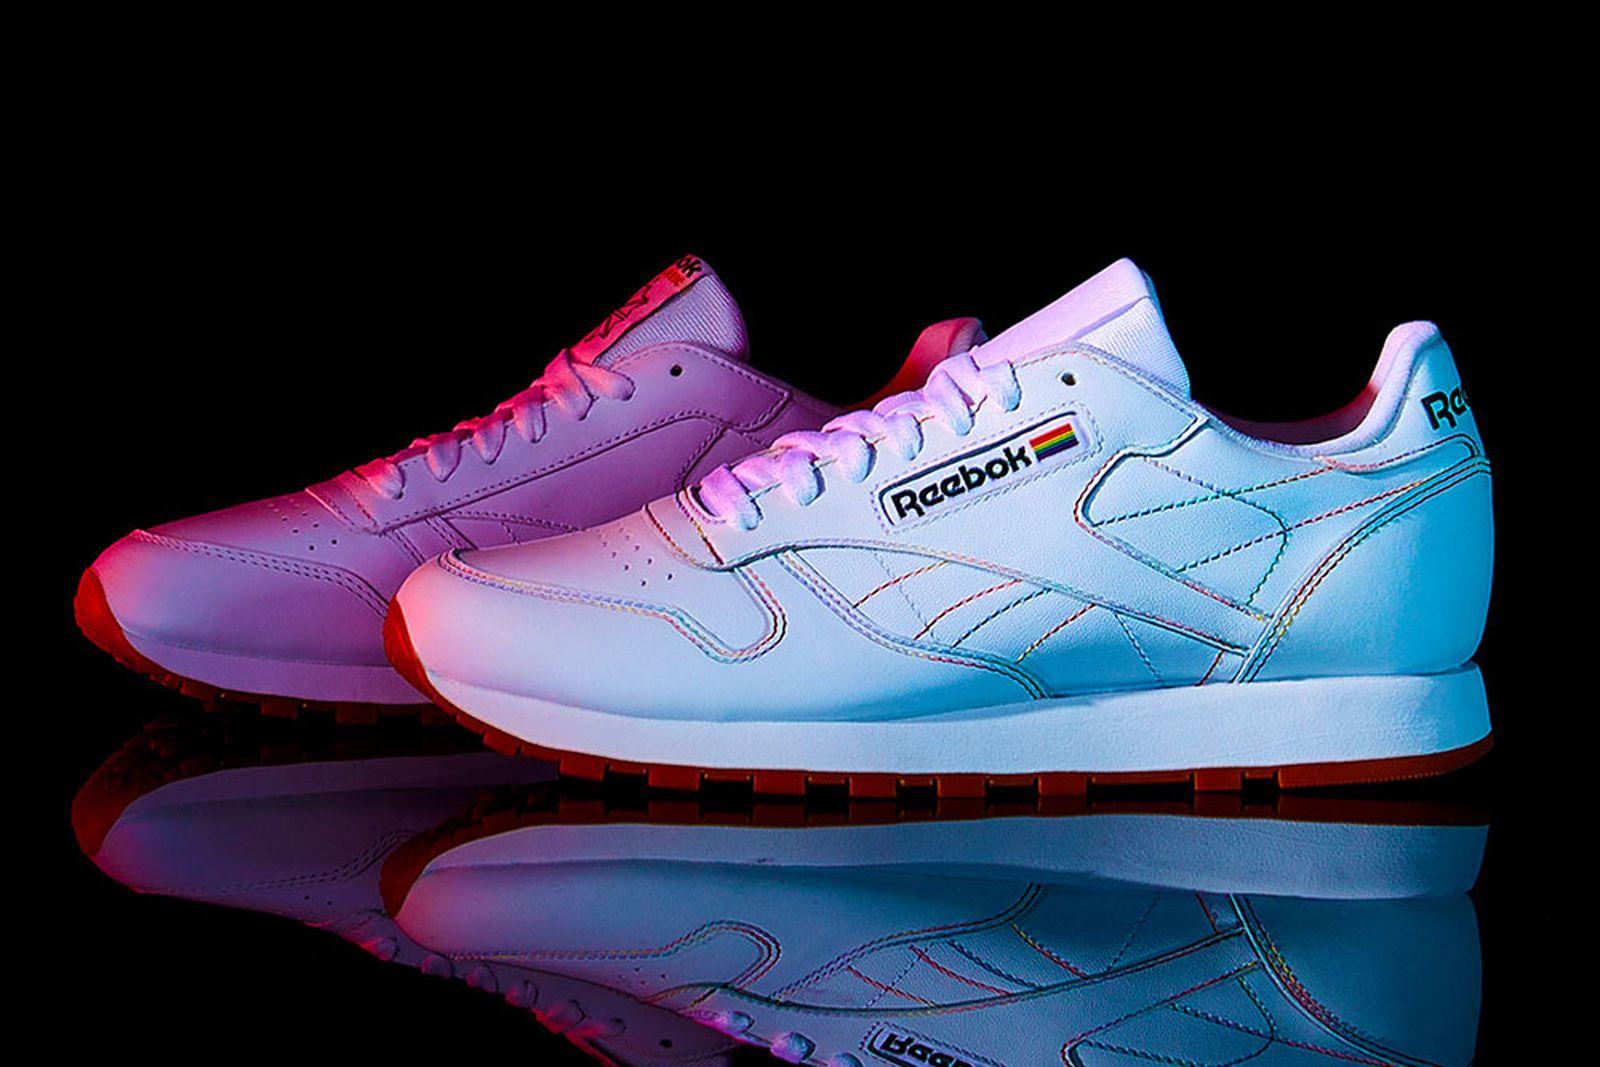 reebok pride sneakers release date price Reebok Freestyle Hi reebok classic leather reebok club c 85